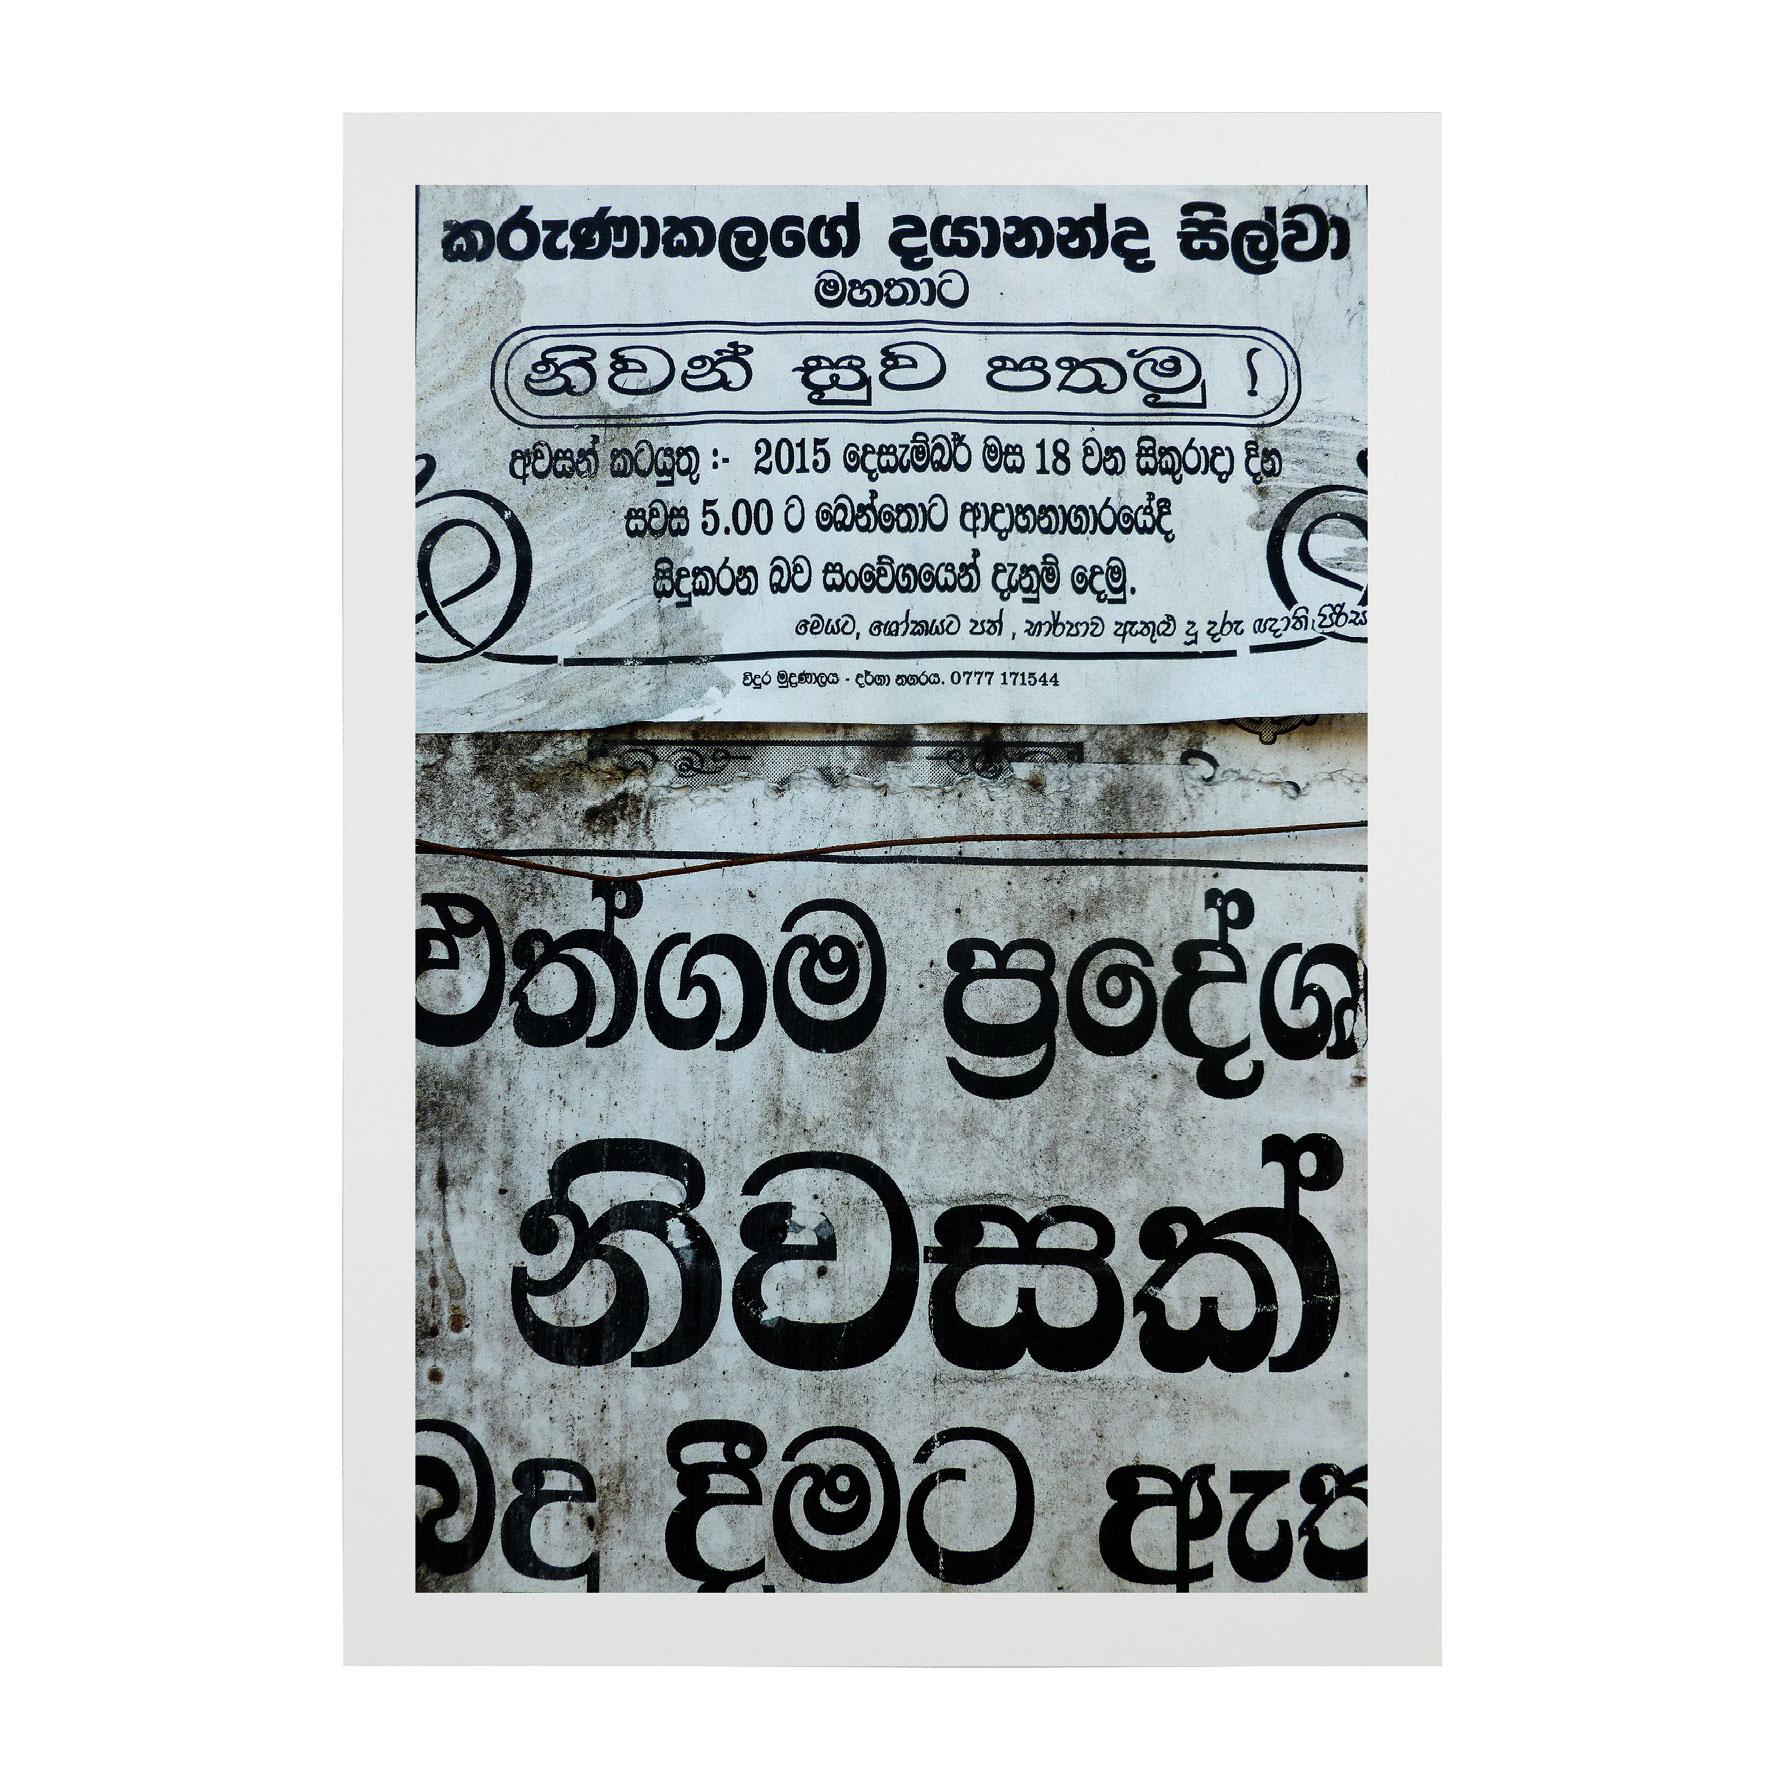 SRI-LANKA-WEB-PICS-5